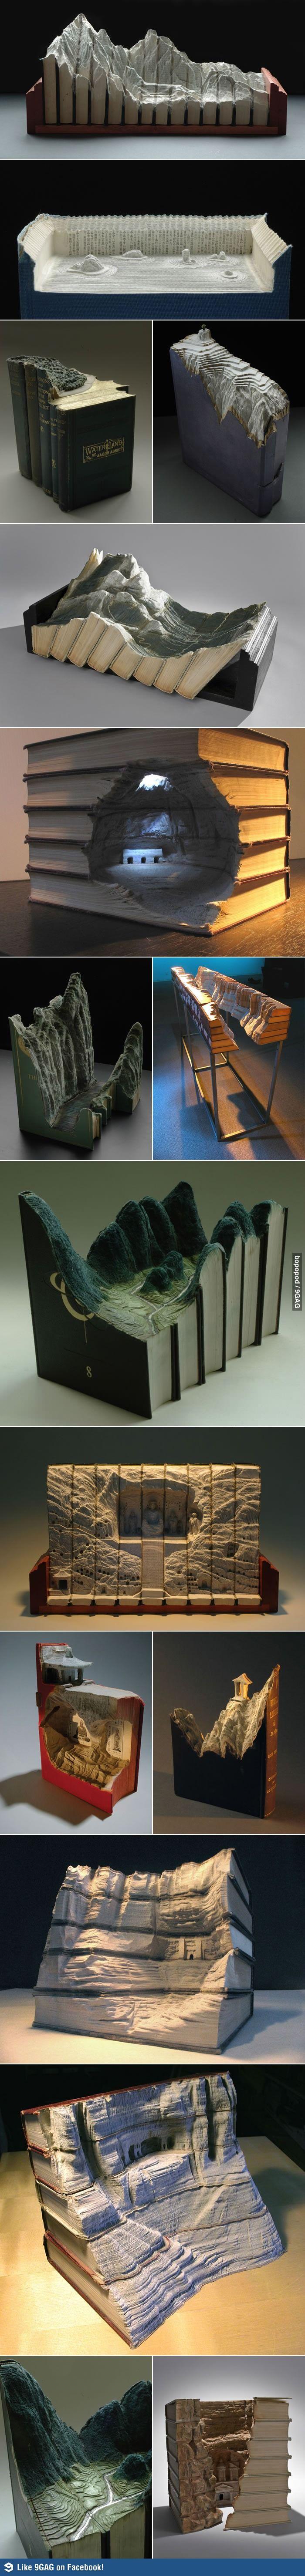 landscapes carved in books